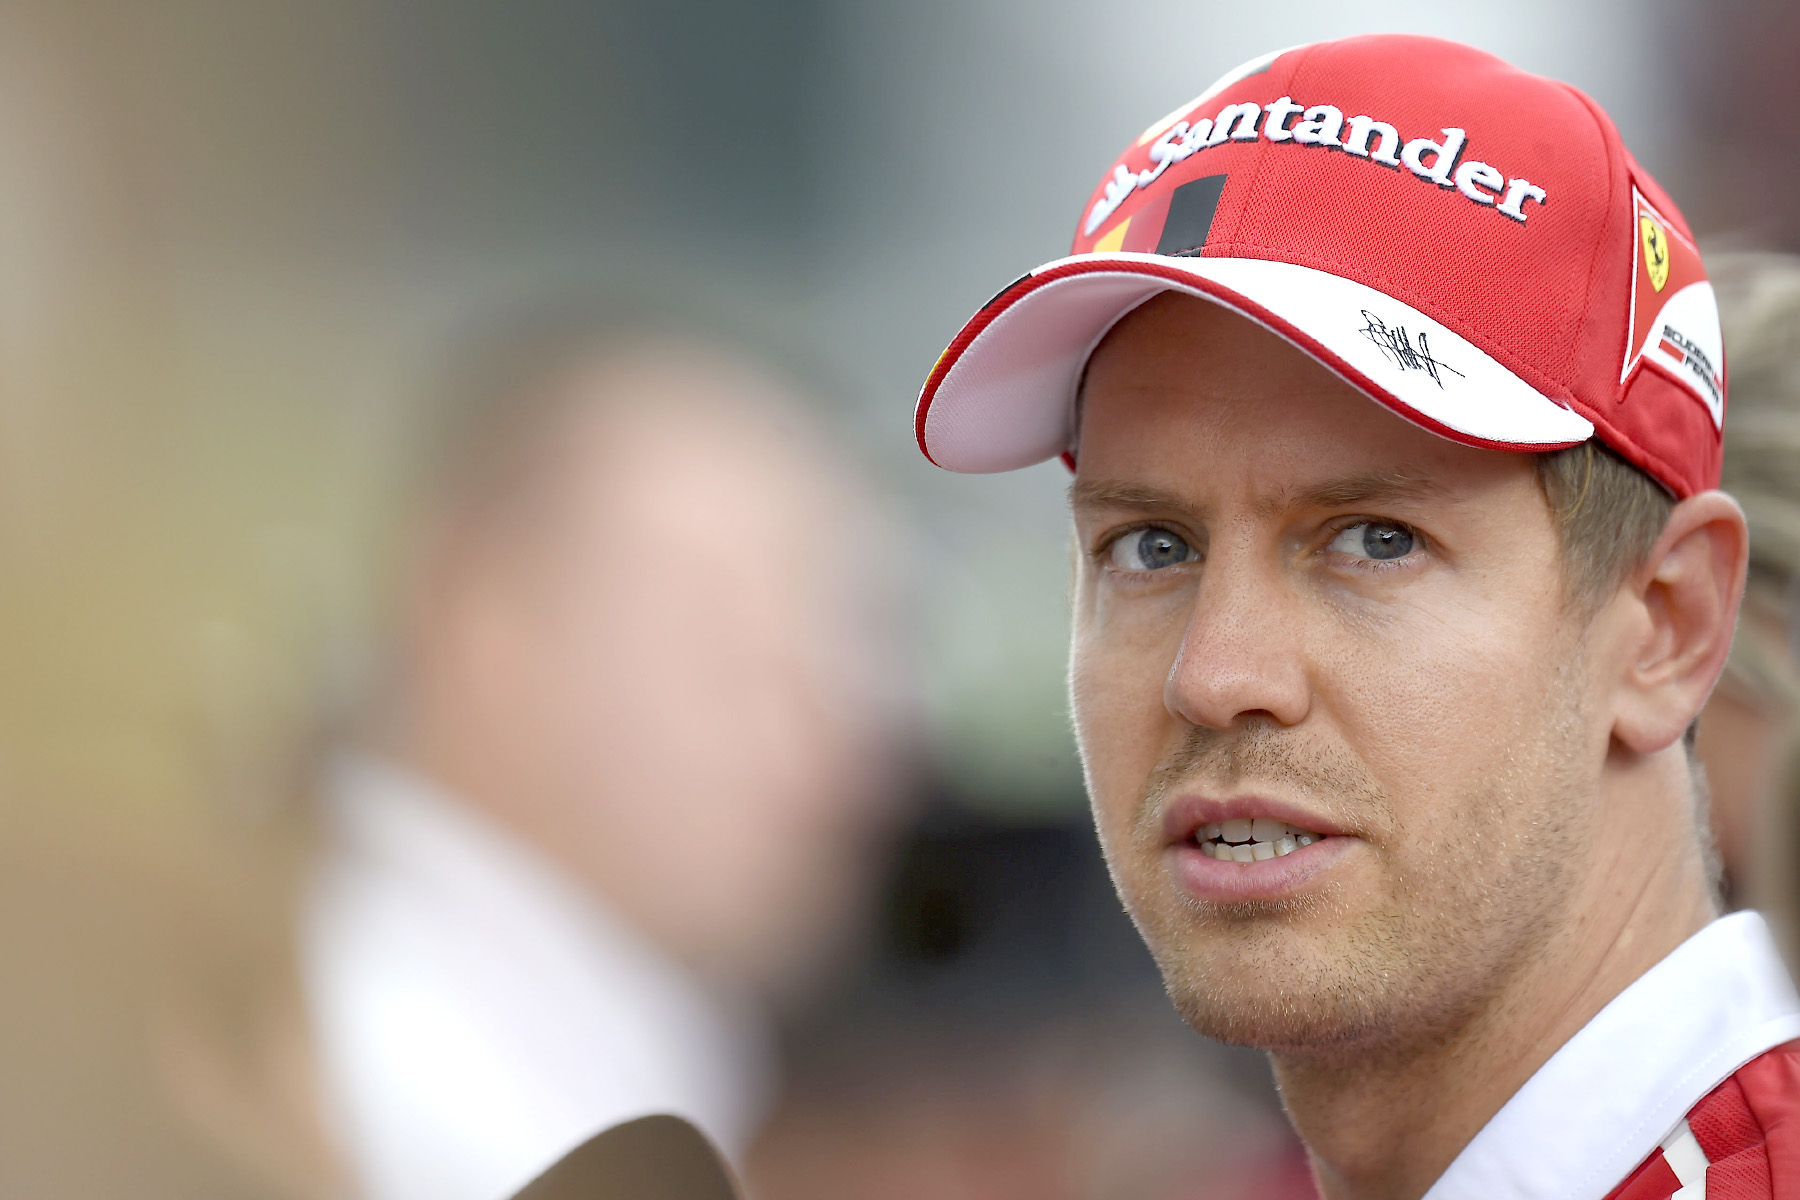 Sebastian Vettel at the Austrian Grand Prix.